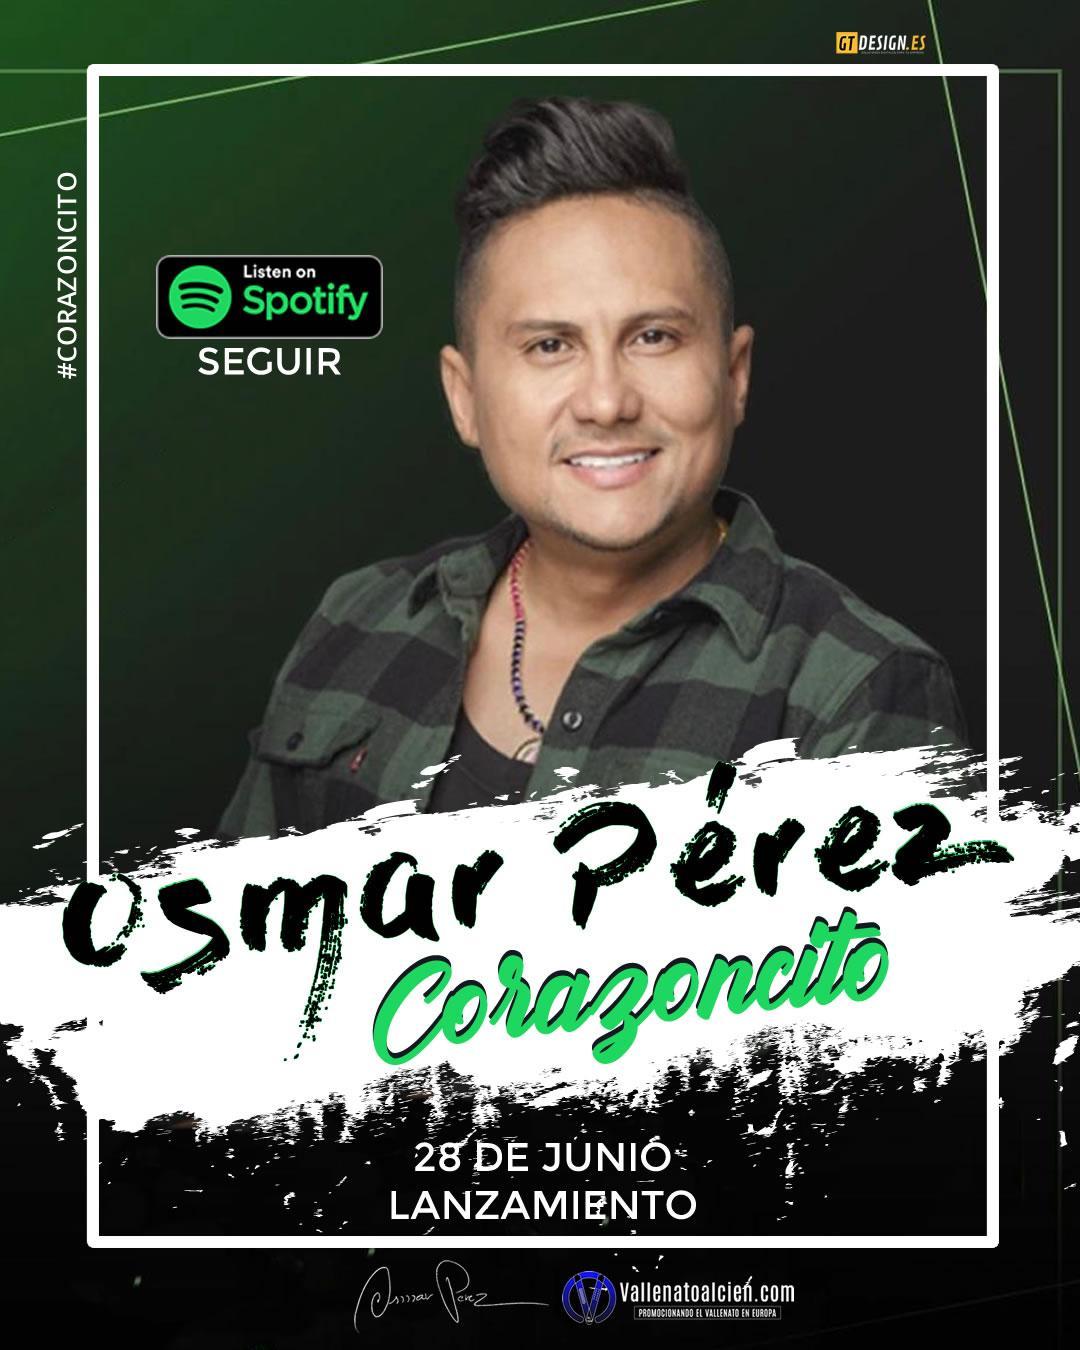 Osmar Pérez Corazoncito